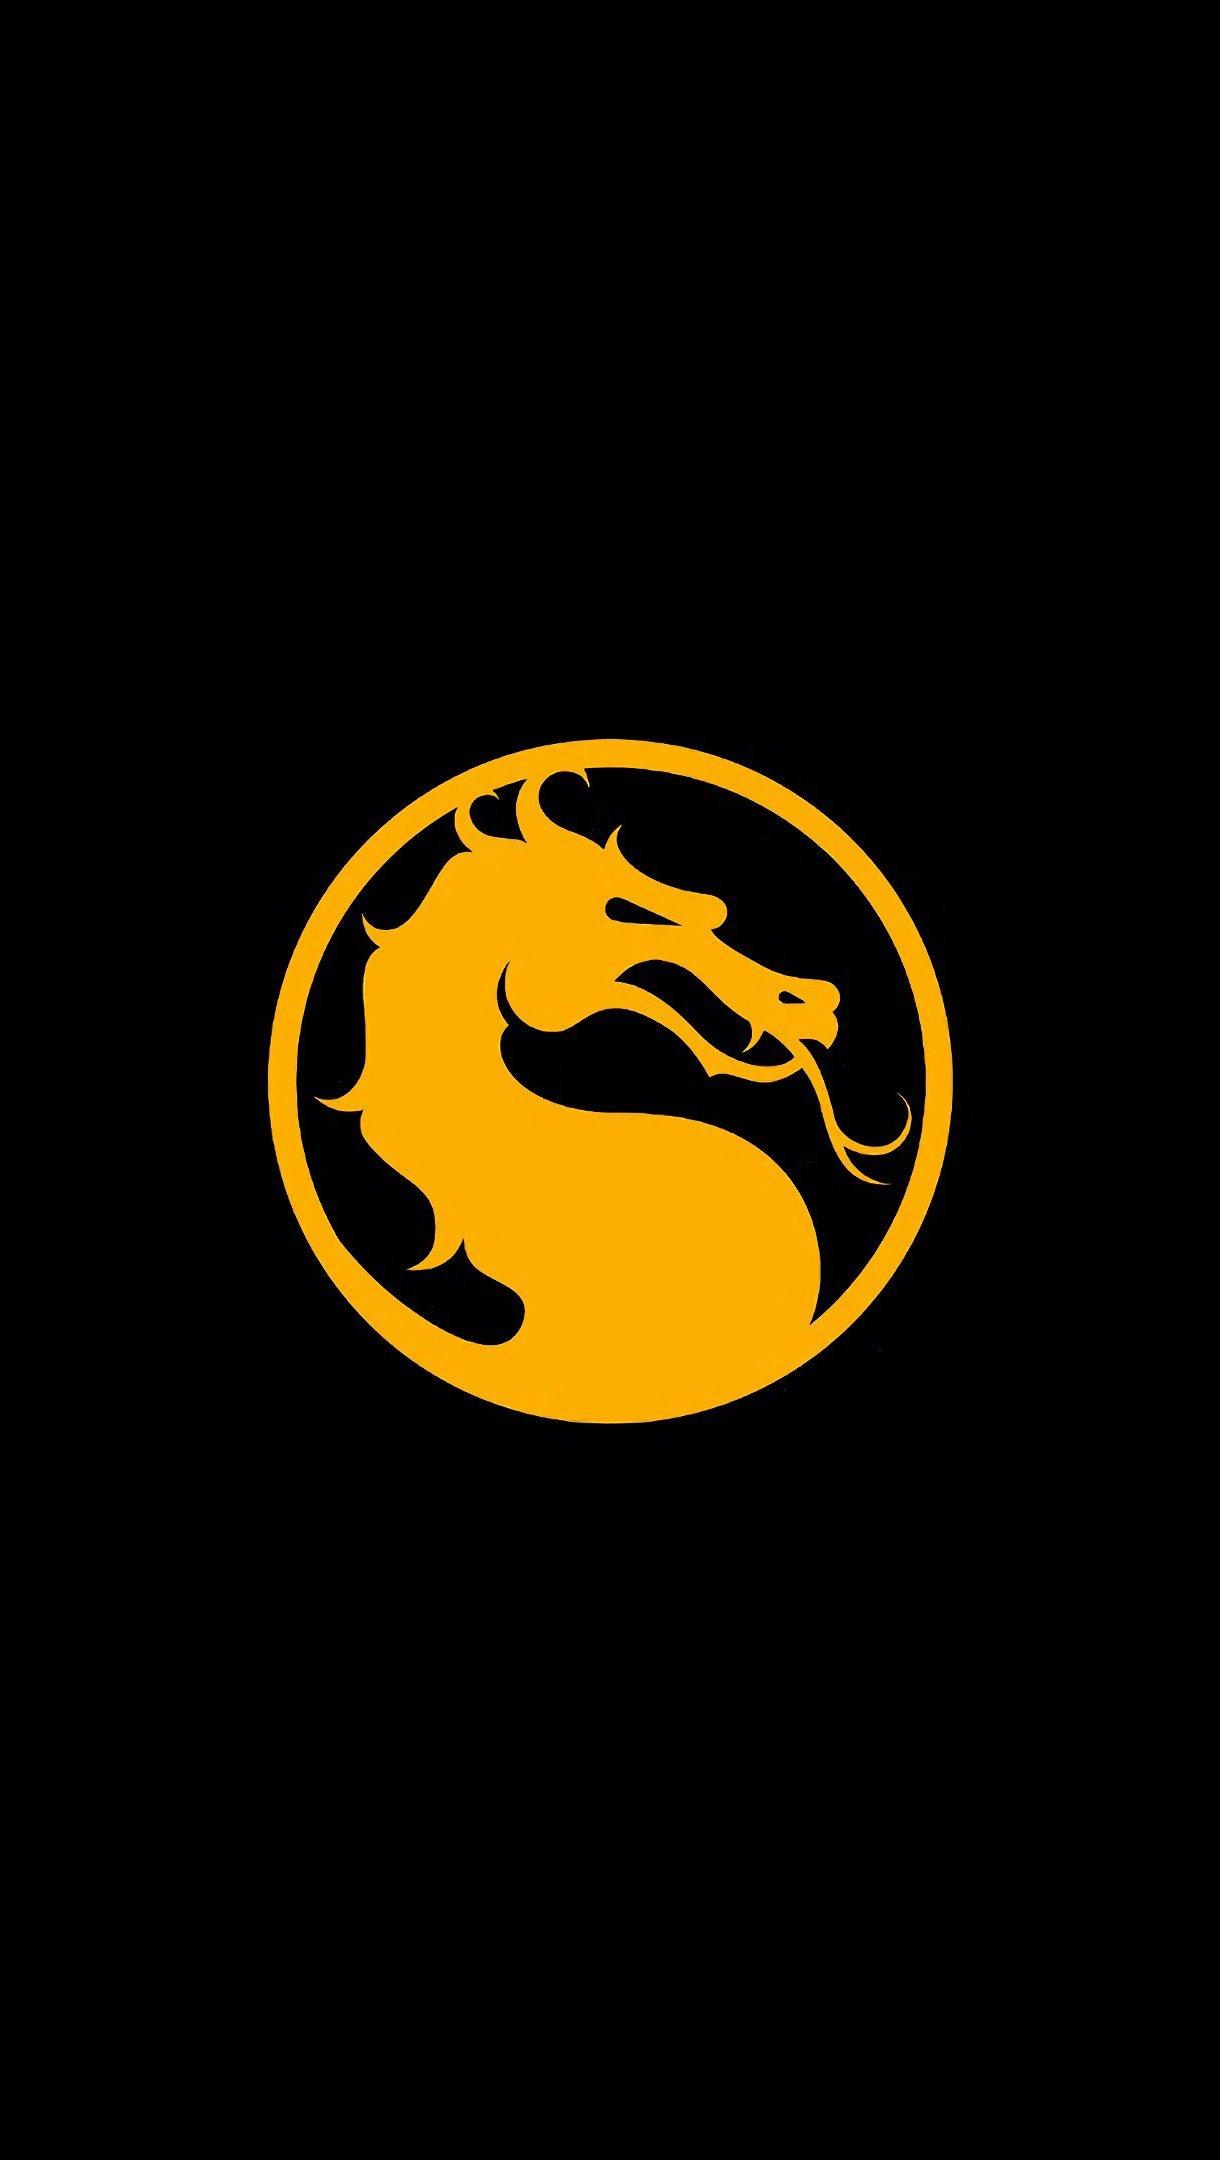 Fondos de pantalla Mortal Kombat 11 Logo Dragón Vertical